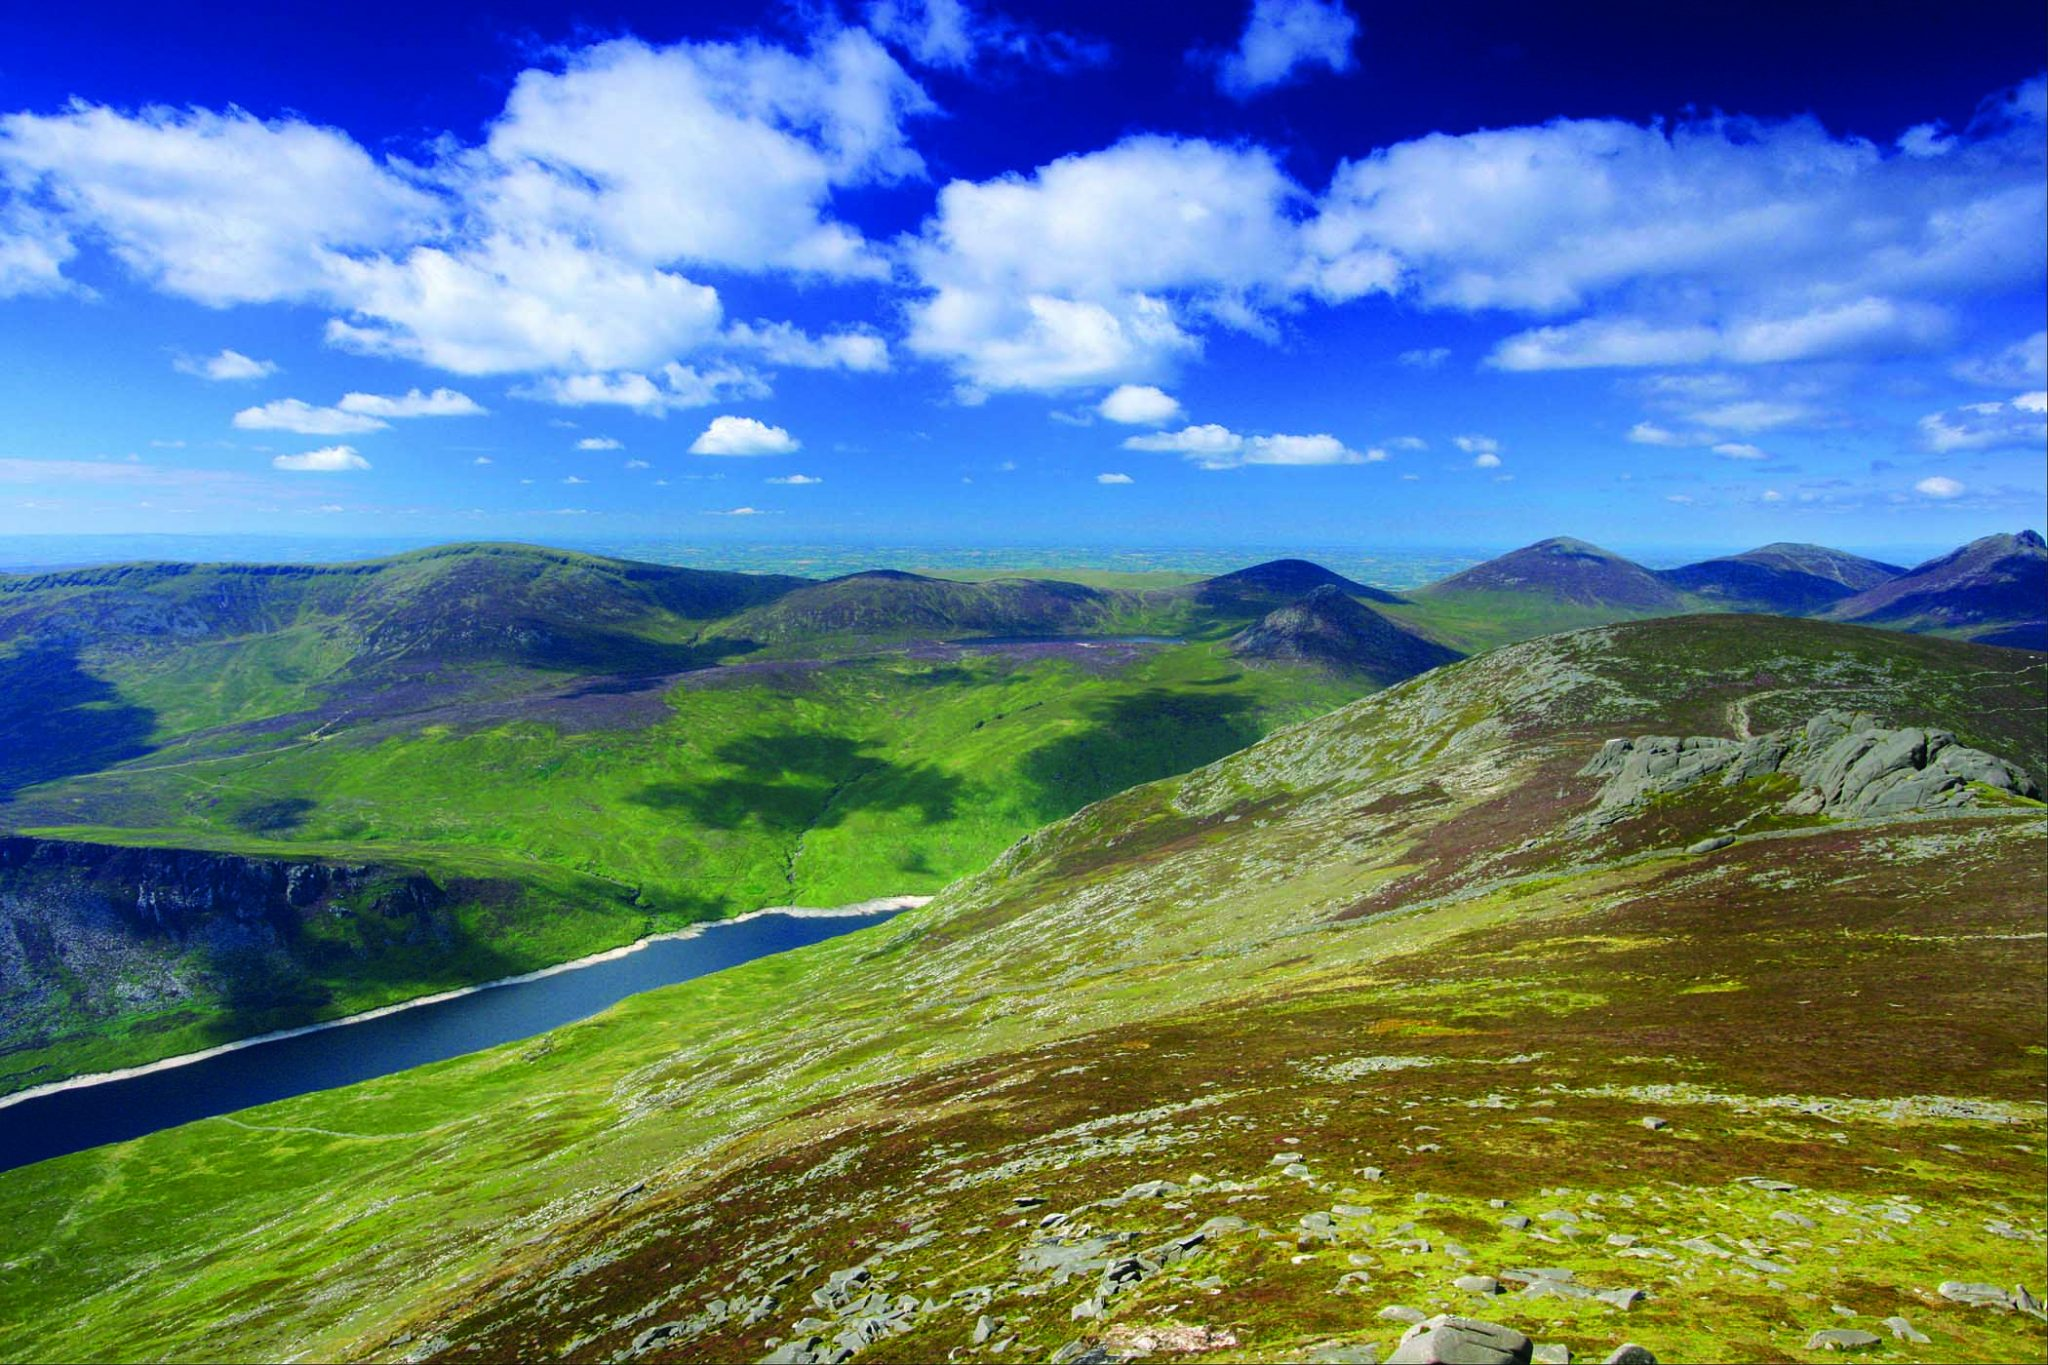 ENJOY A DELIGHTFULLY DEVILISH HALLOWEEN IN NORTHERN IRELAND - Ireland vacation packages 2015